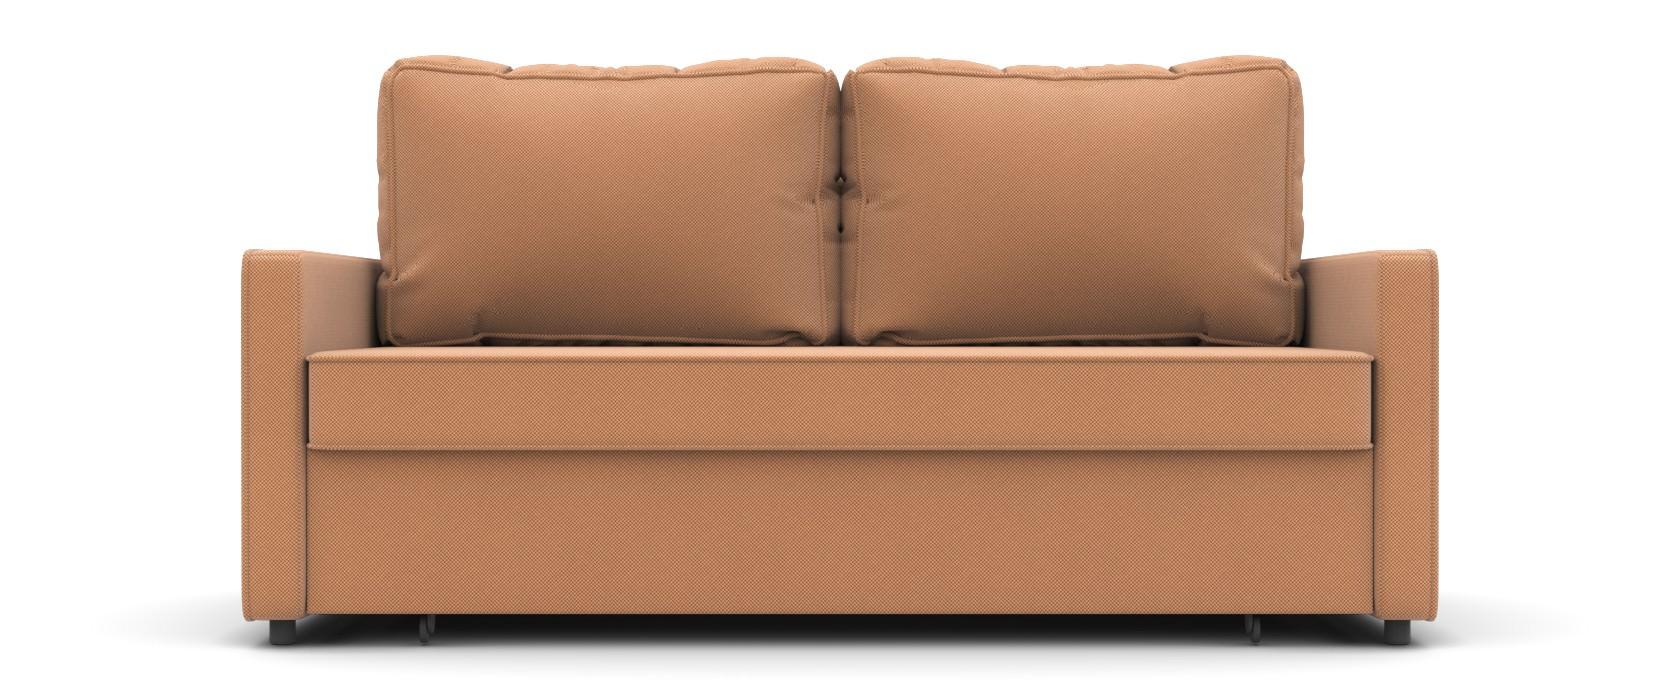 Тримісний диван Mattone - Pufetto